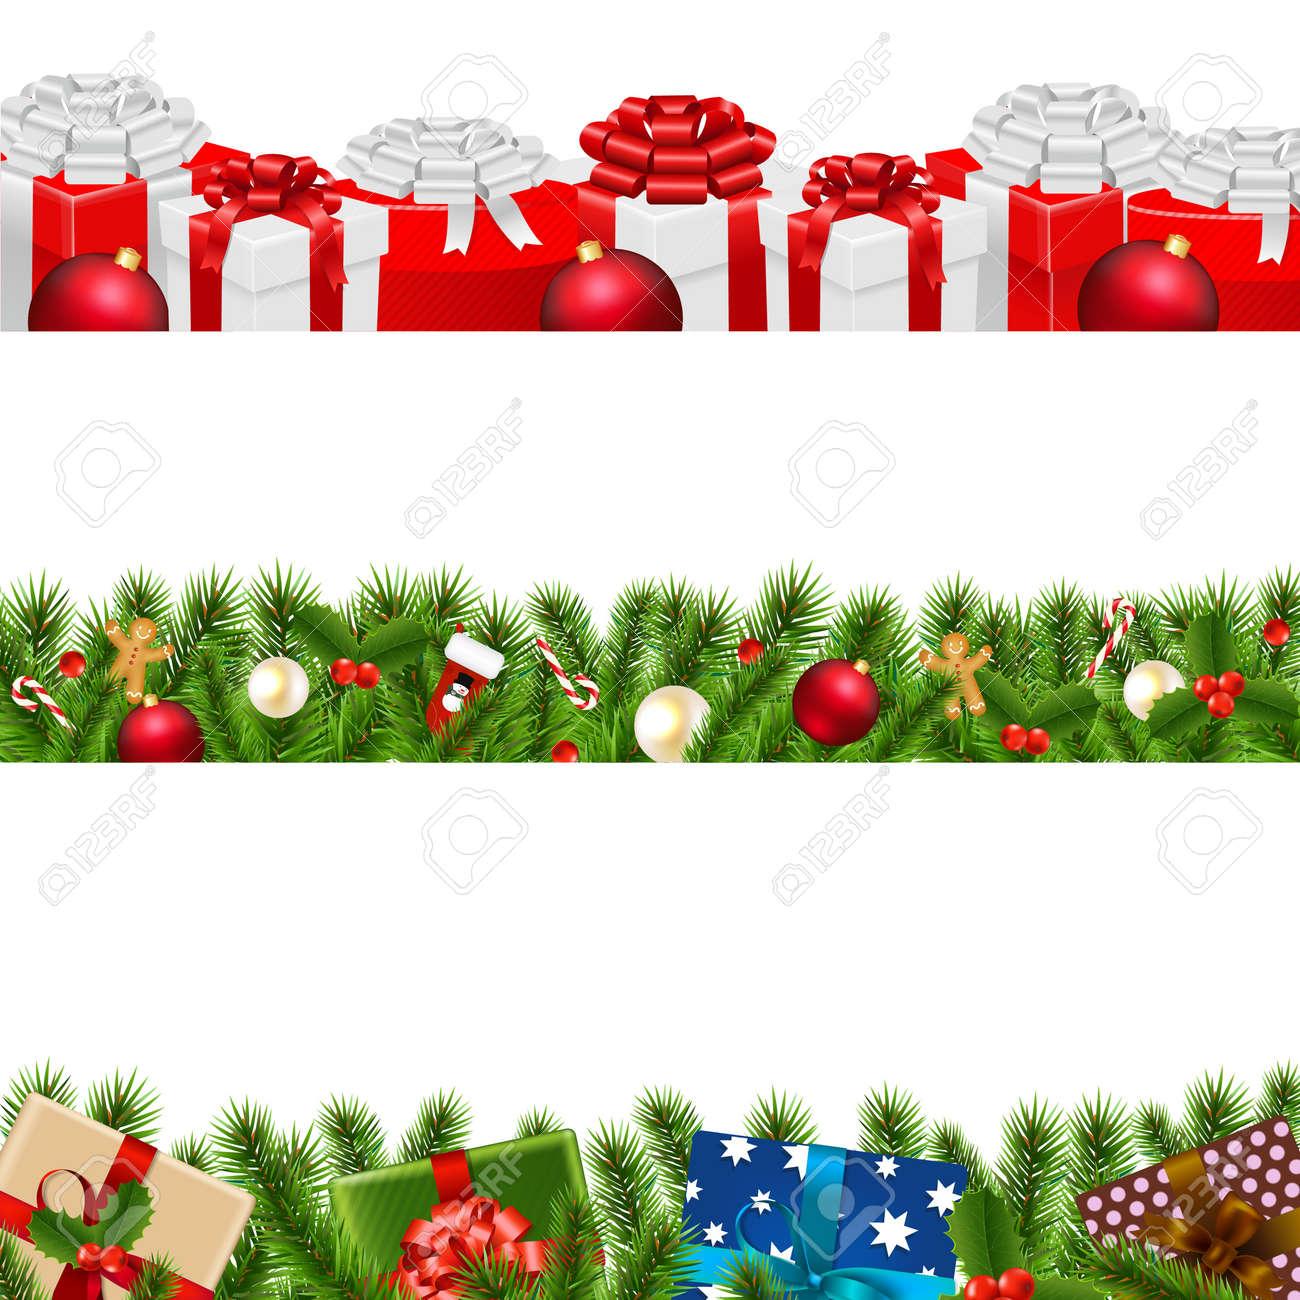 61,866 Christmas Garland Cliparts, Stock Vector And Royalty Free ...